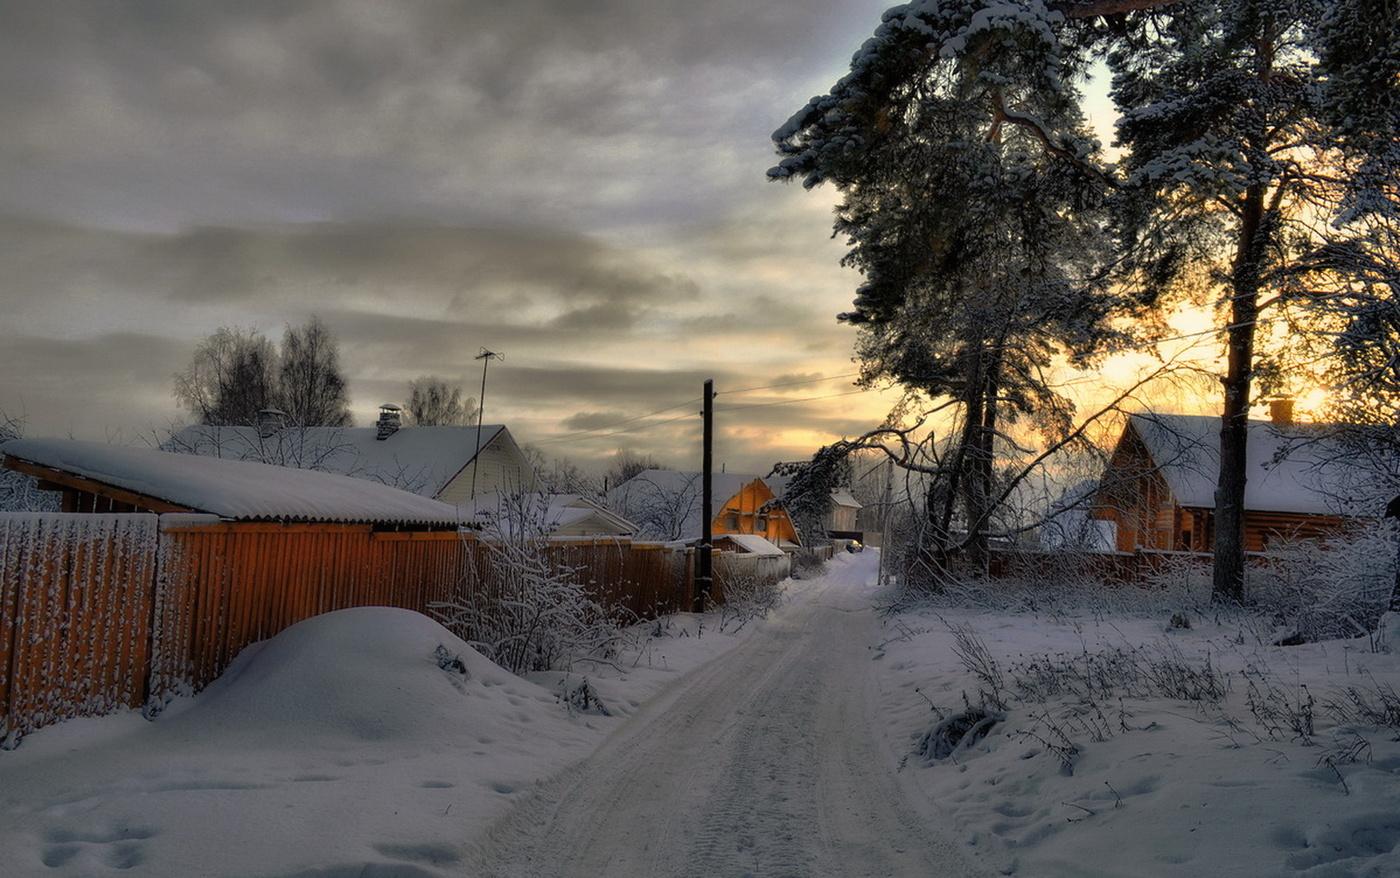 Зима в селе пейзаж фото